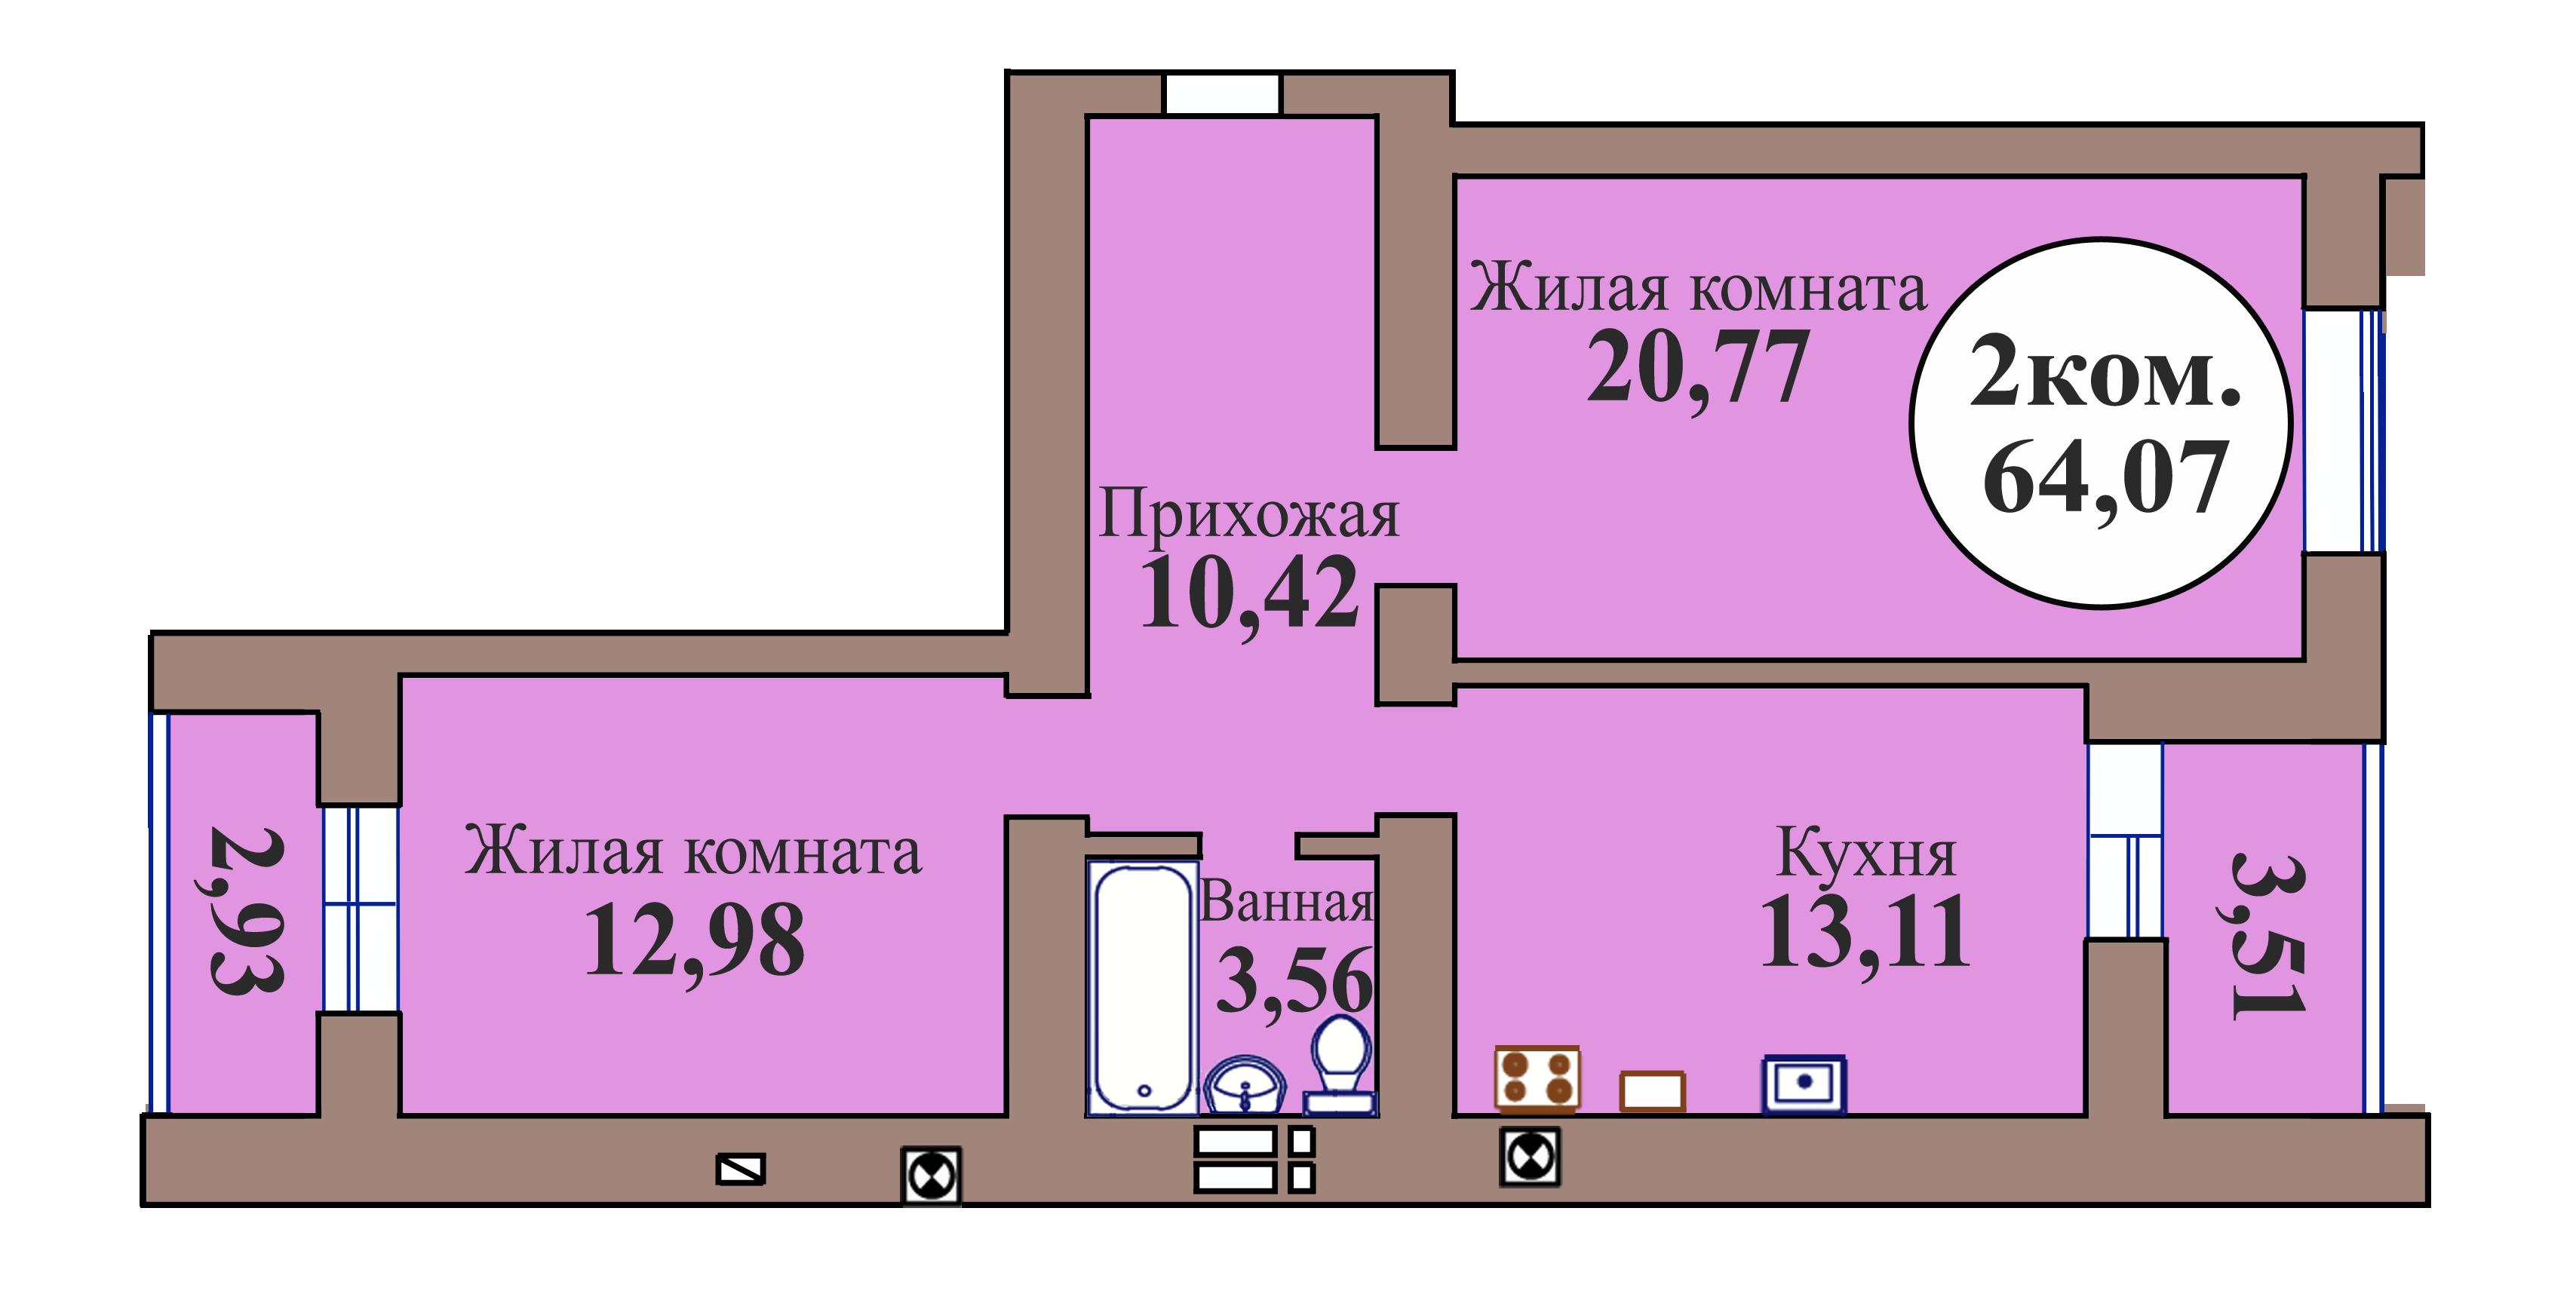 2-комн. кв. по пер. Калининградский, 5 кв. 161 в Калининграде